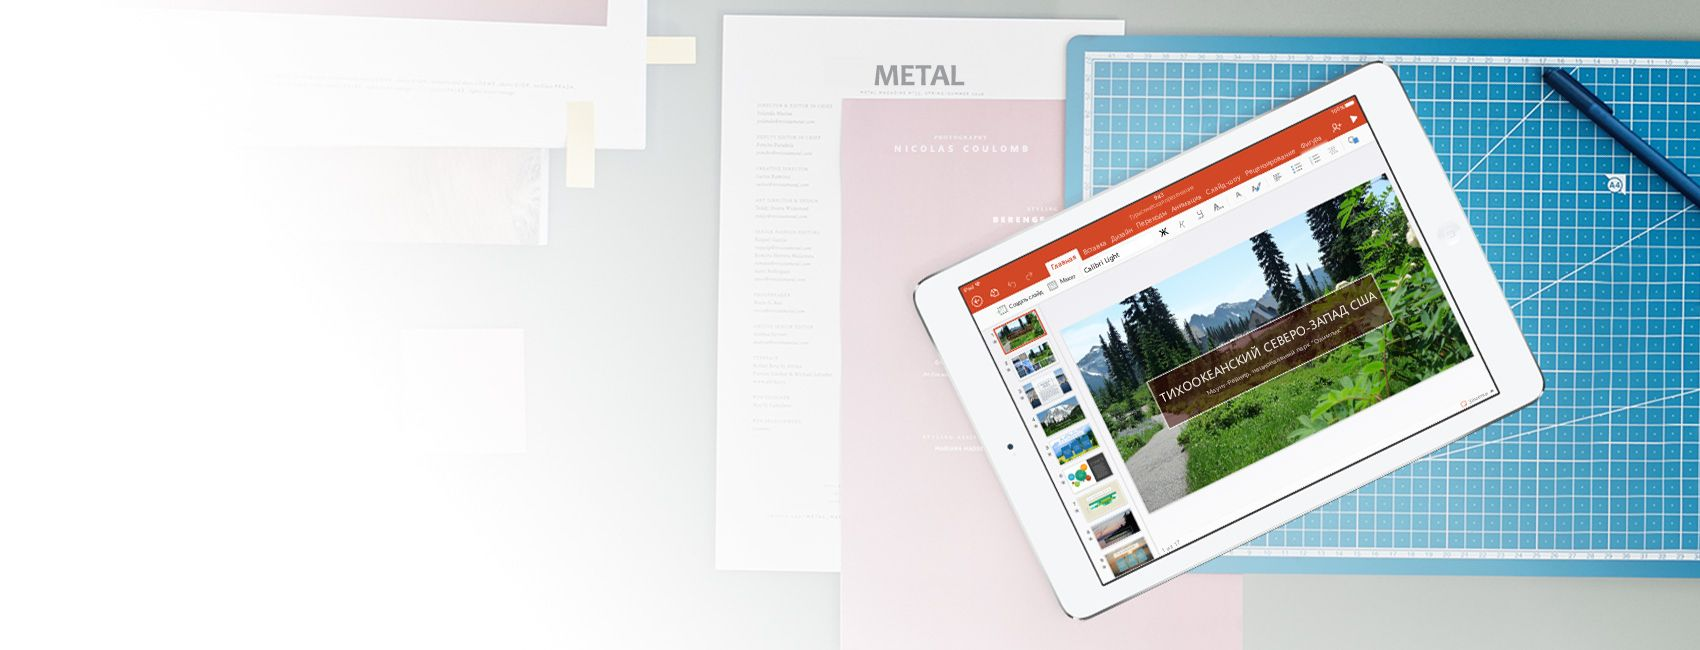 iPad с презентацией PowerPoint о путешествиях по северо-западной части тихоокеанского побережья США.